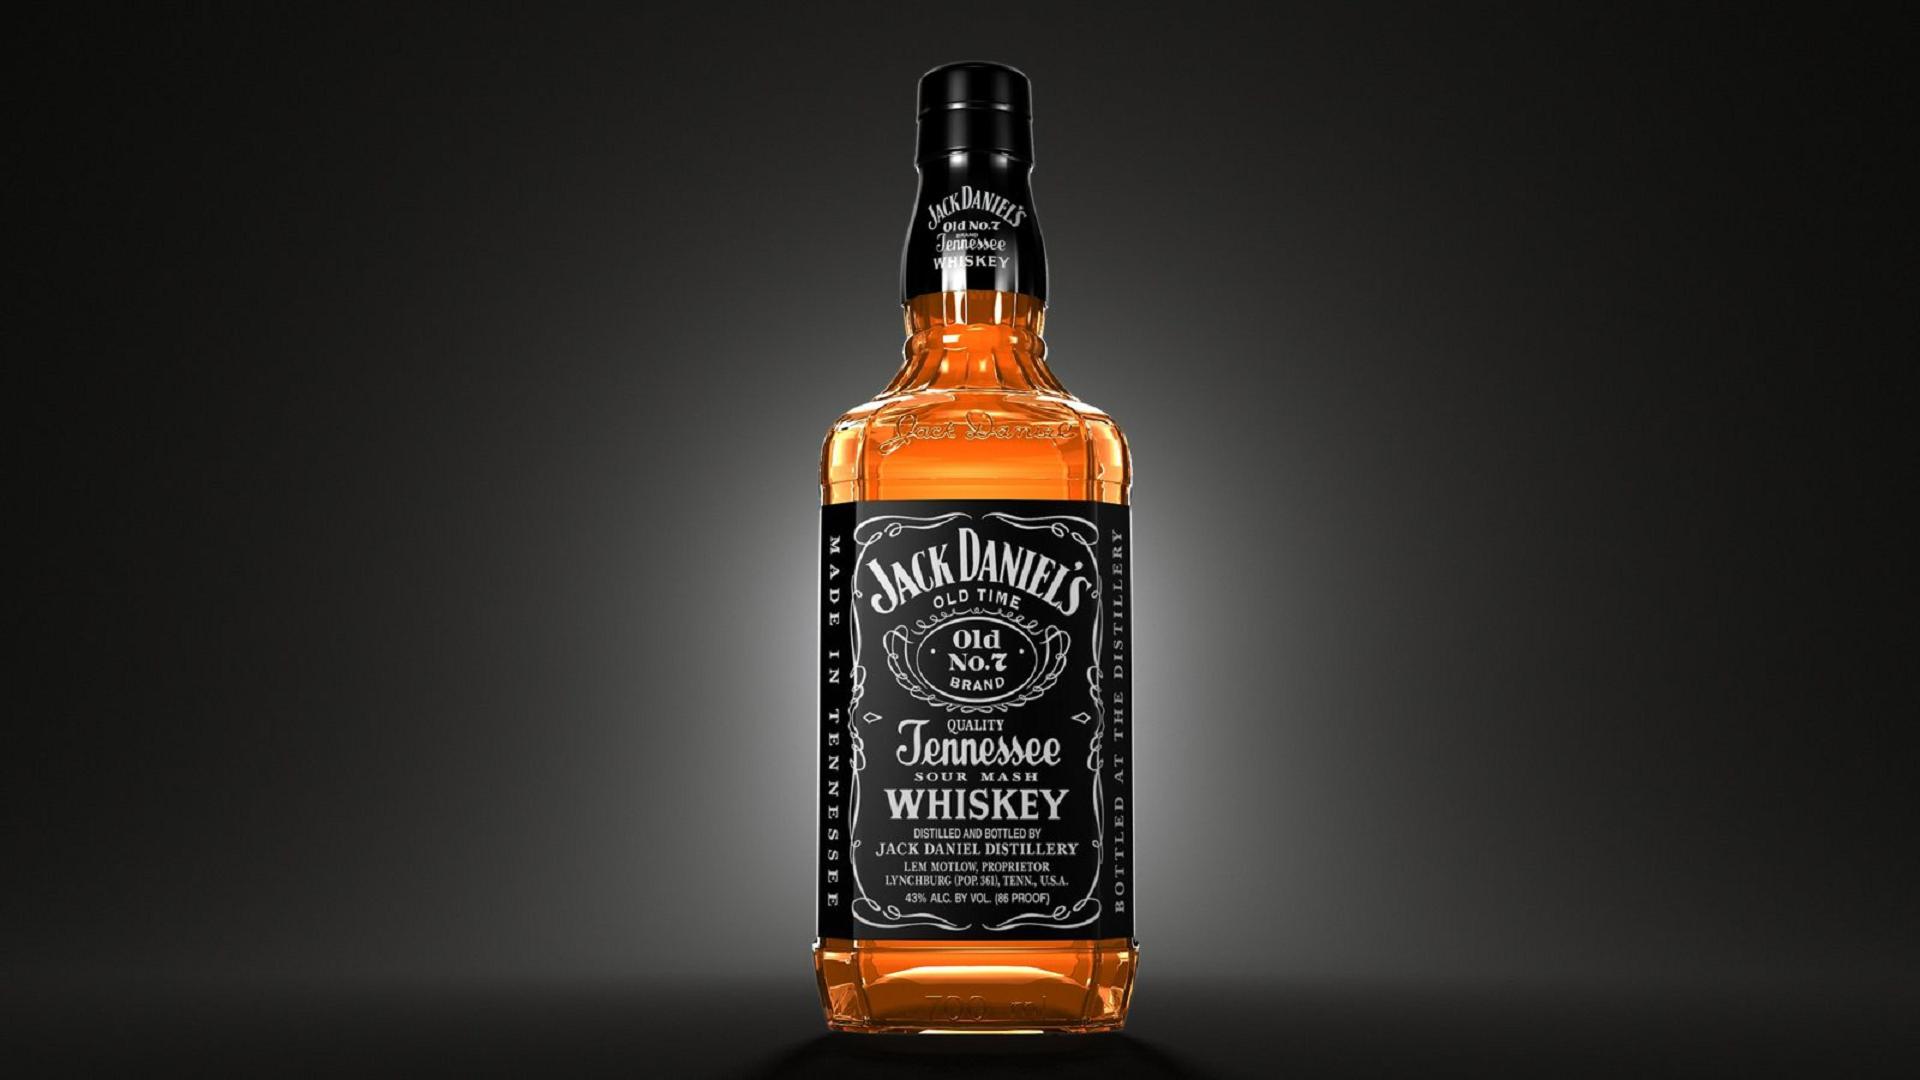 Wow 10+ Wallpaper Desktop Jack Daniels - Joen Wallpaper